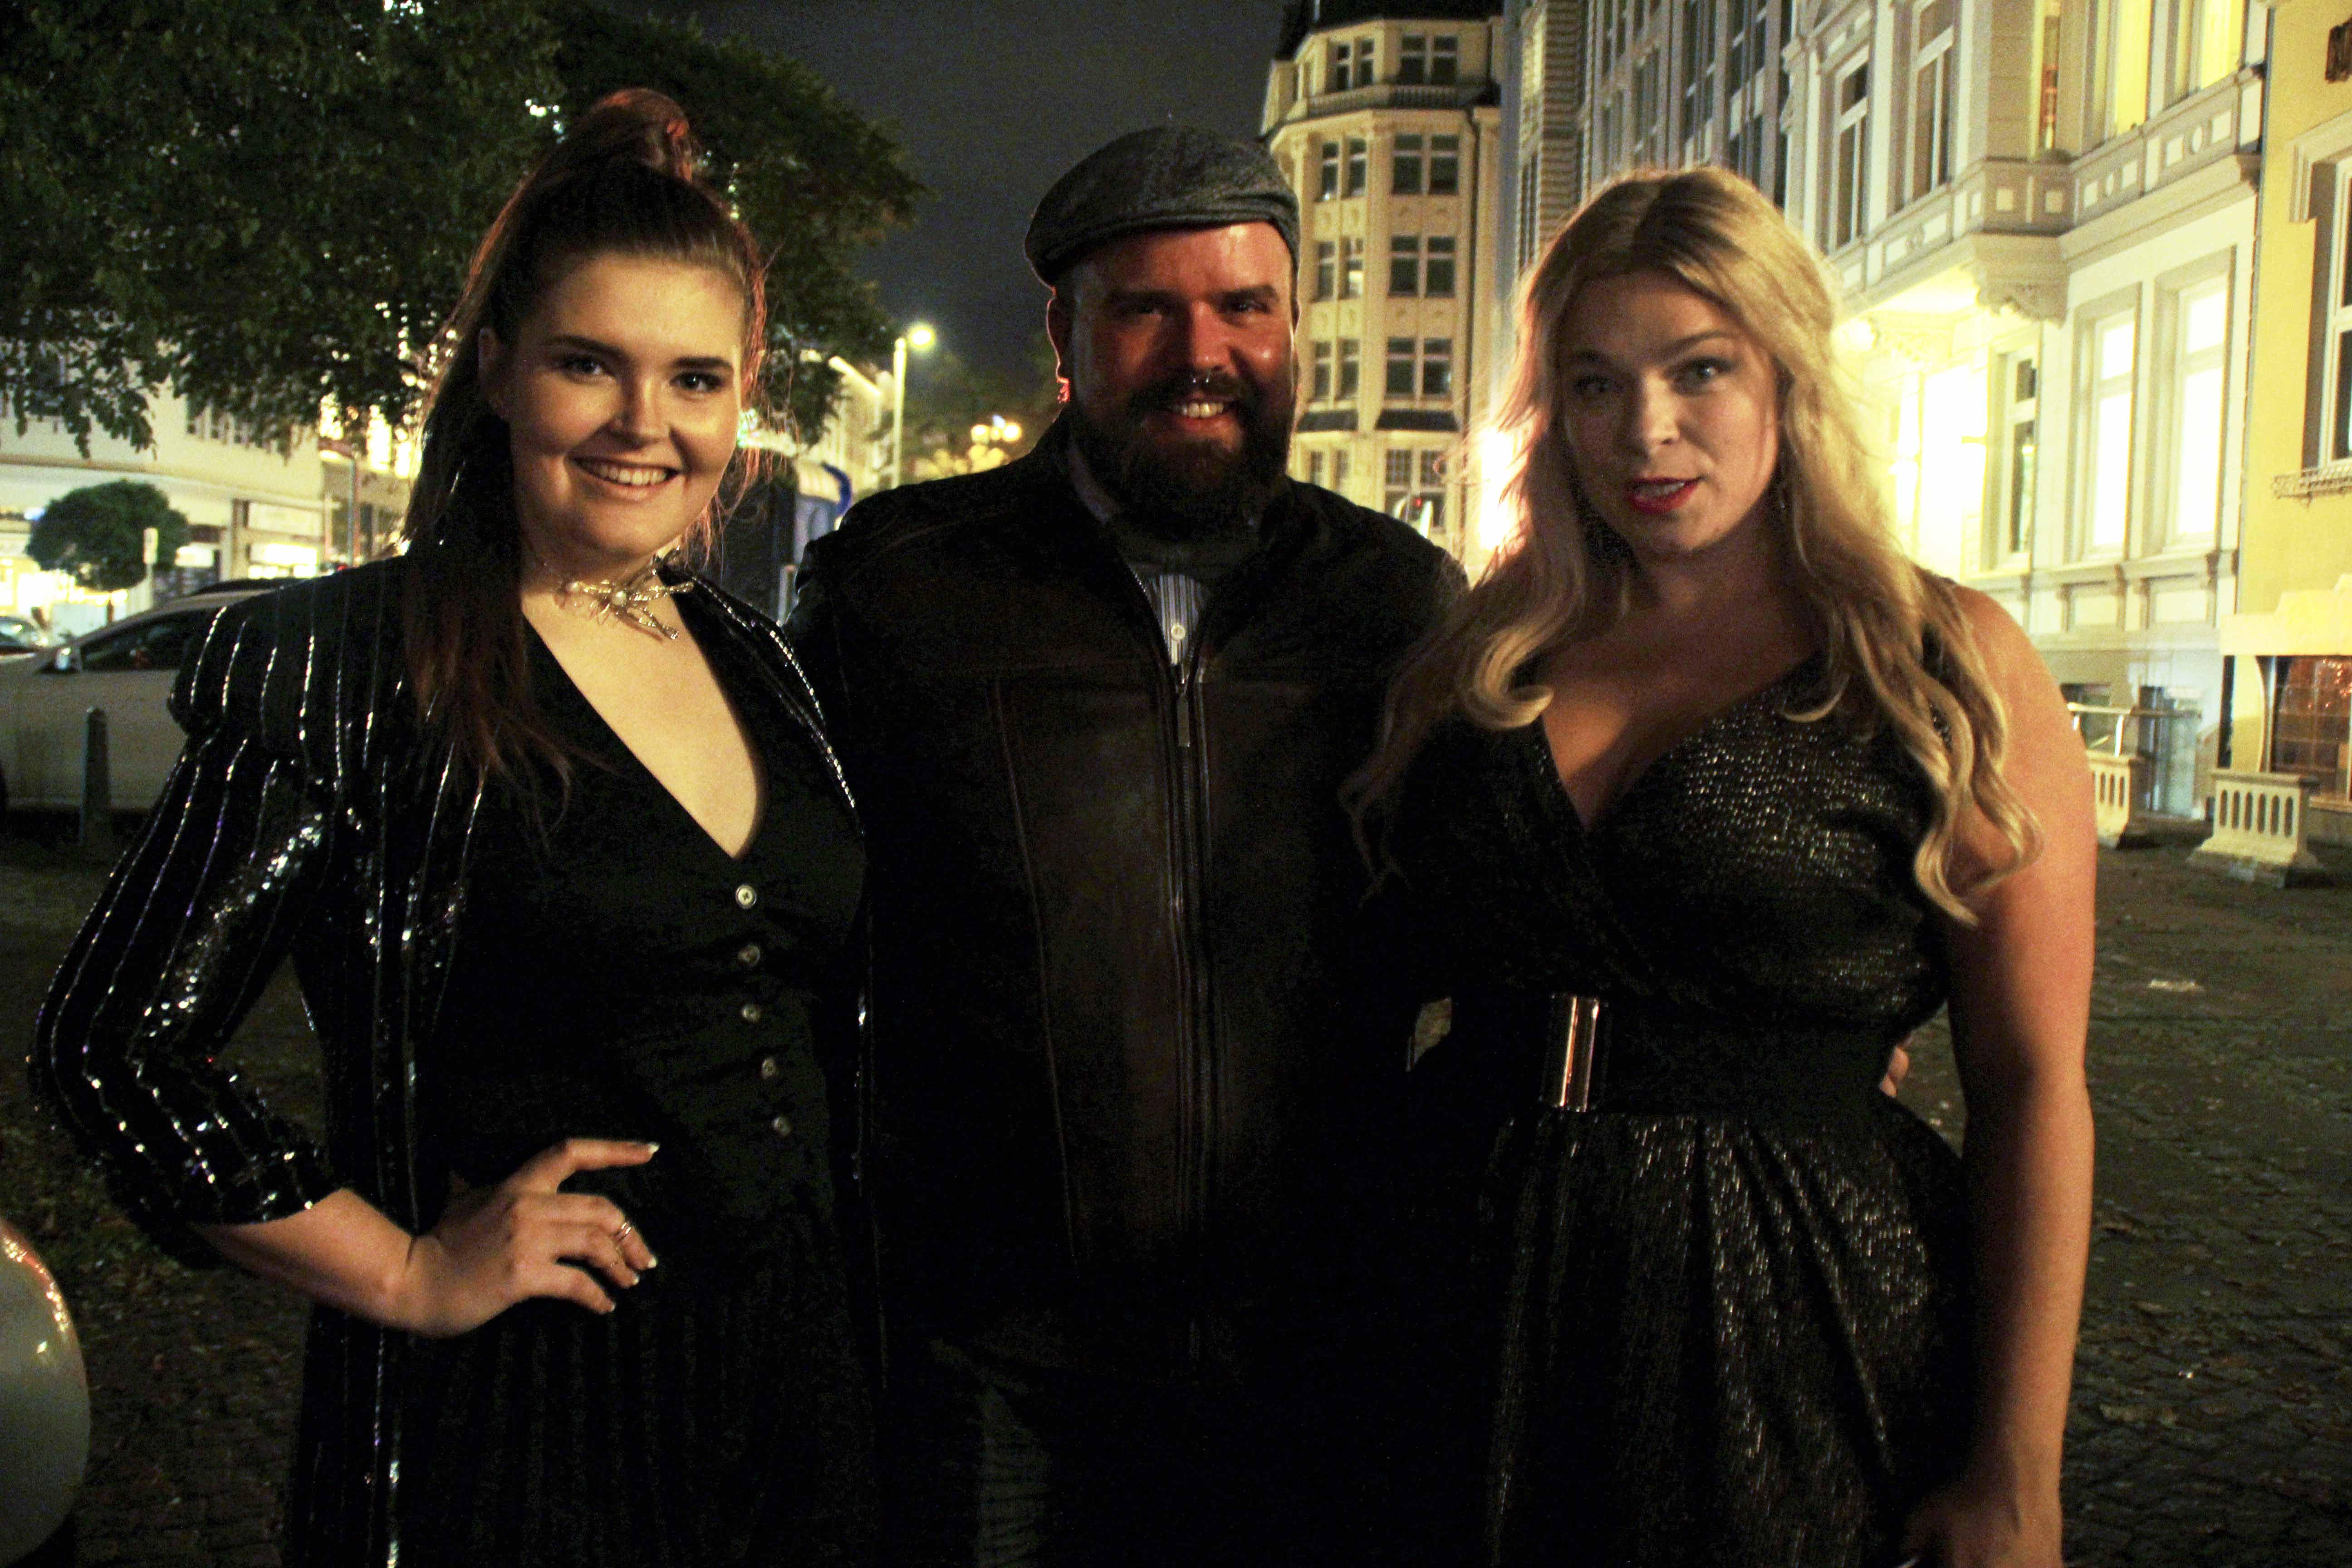 PLussize-Partyoutfit-Megabambi-Caterina-pogorzelski-Plussizeblogger